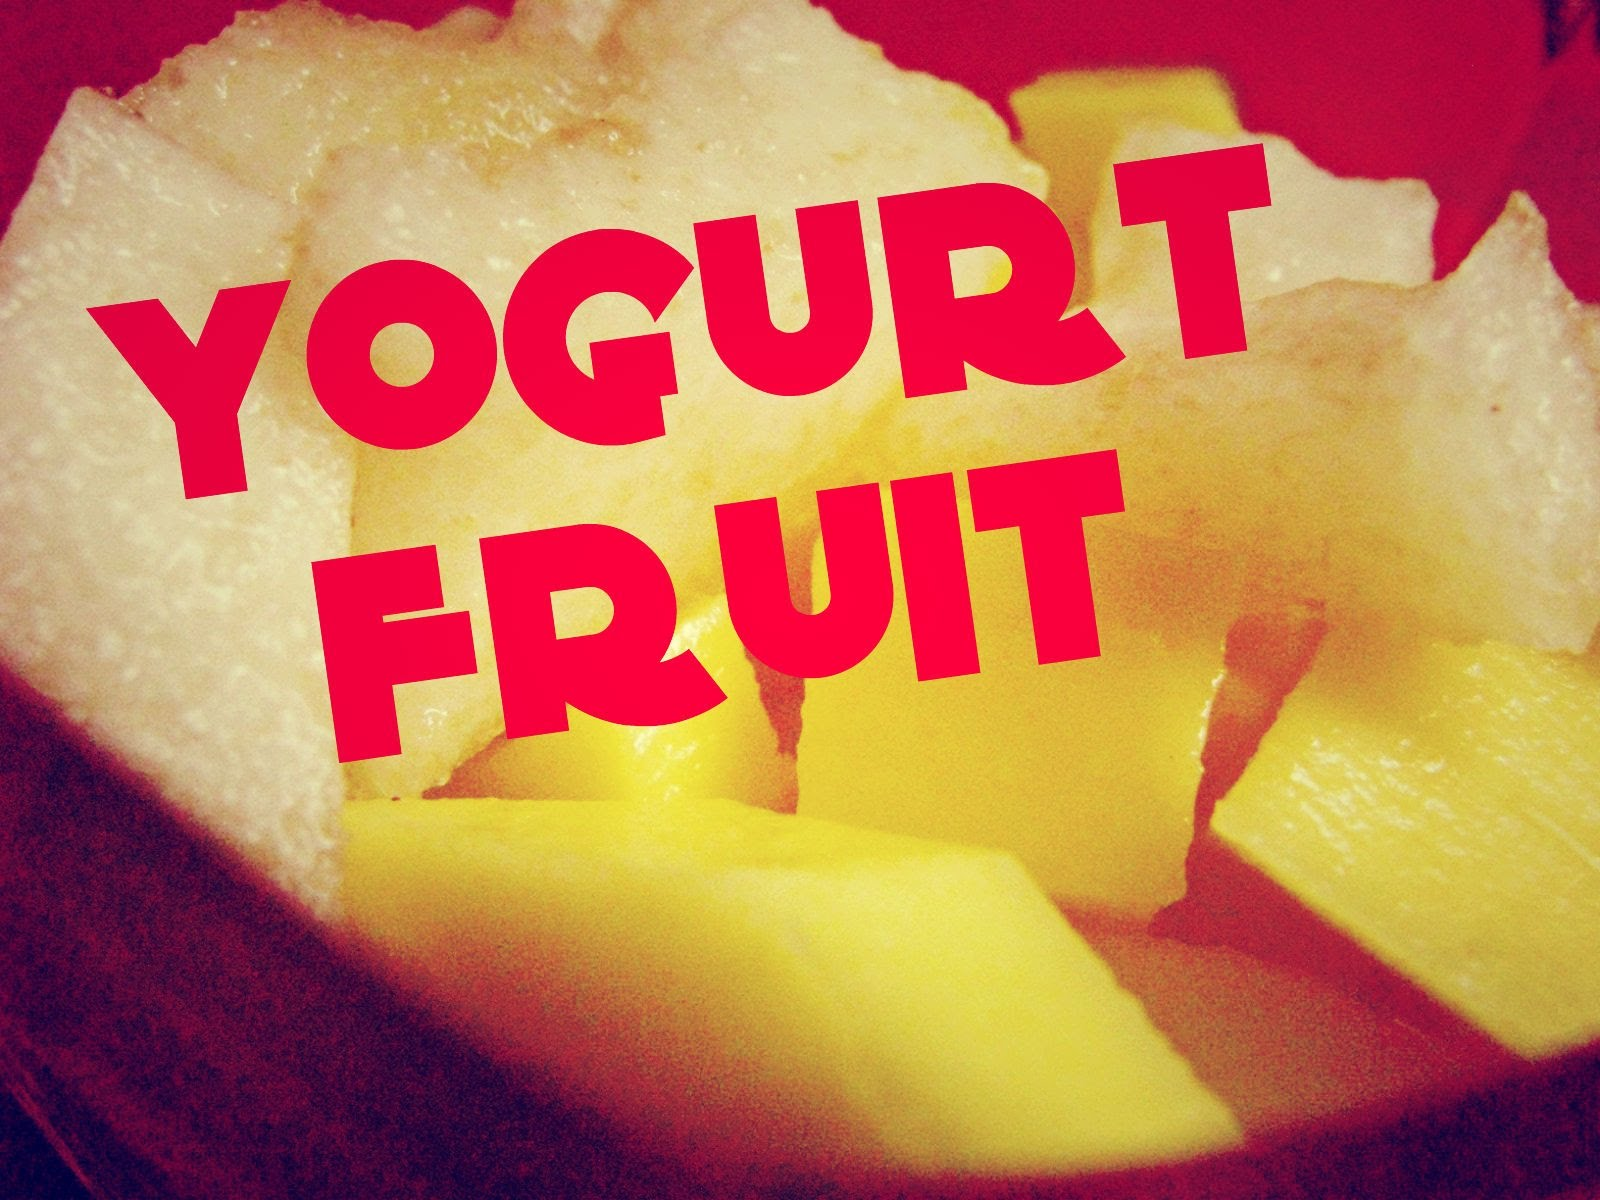 ✿ Healthy Recipes: Yogurt Fruit (Dessert)✿ [Official Video]